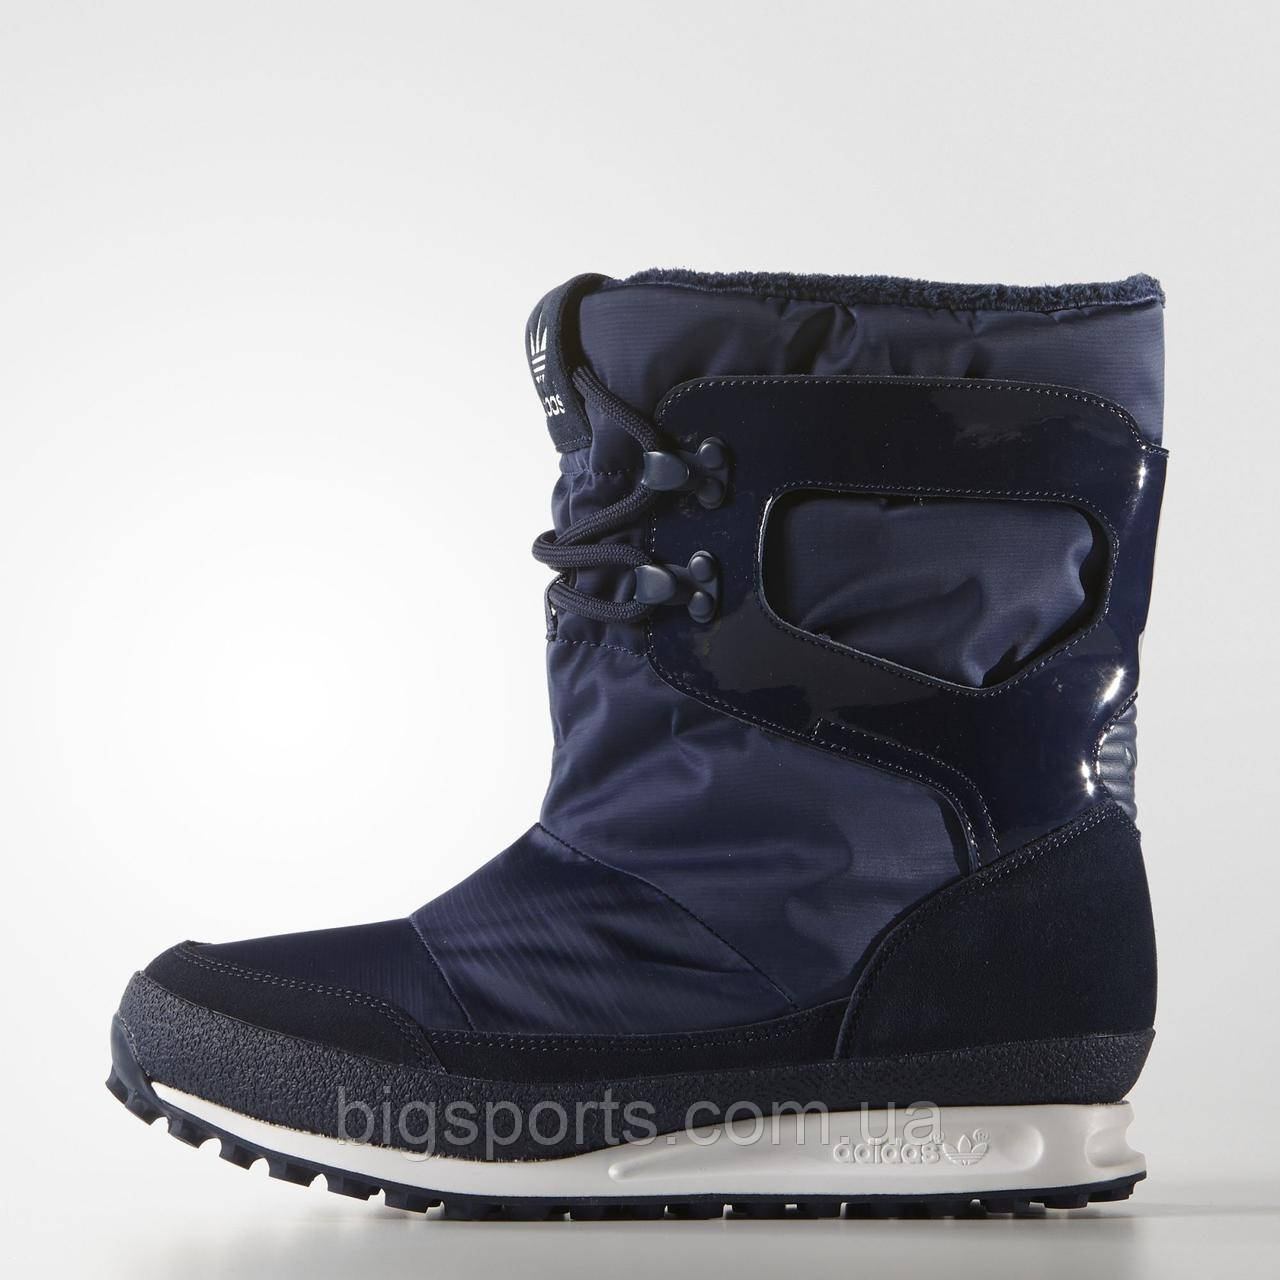 Сапоги жен. Adidas Snowrush W (арт. S81384)